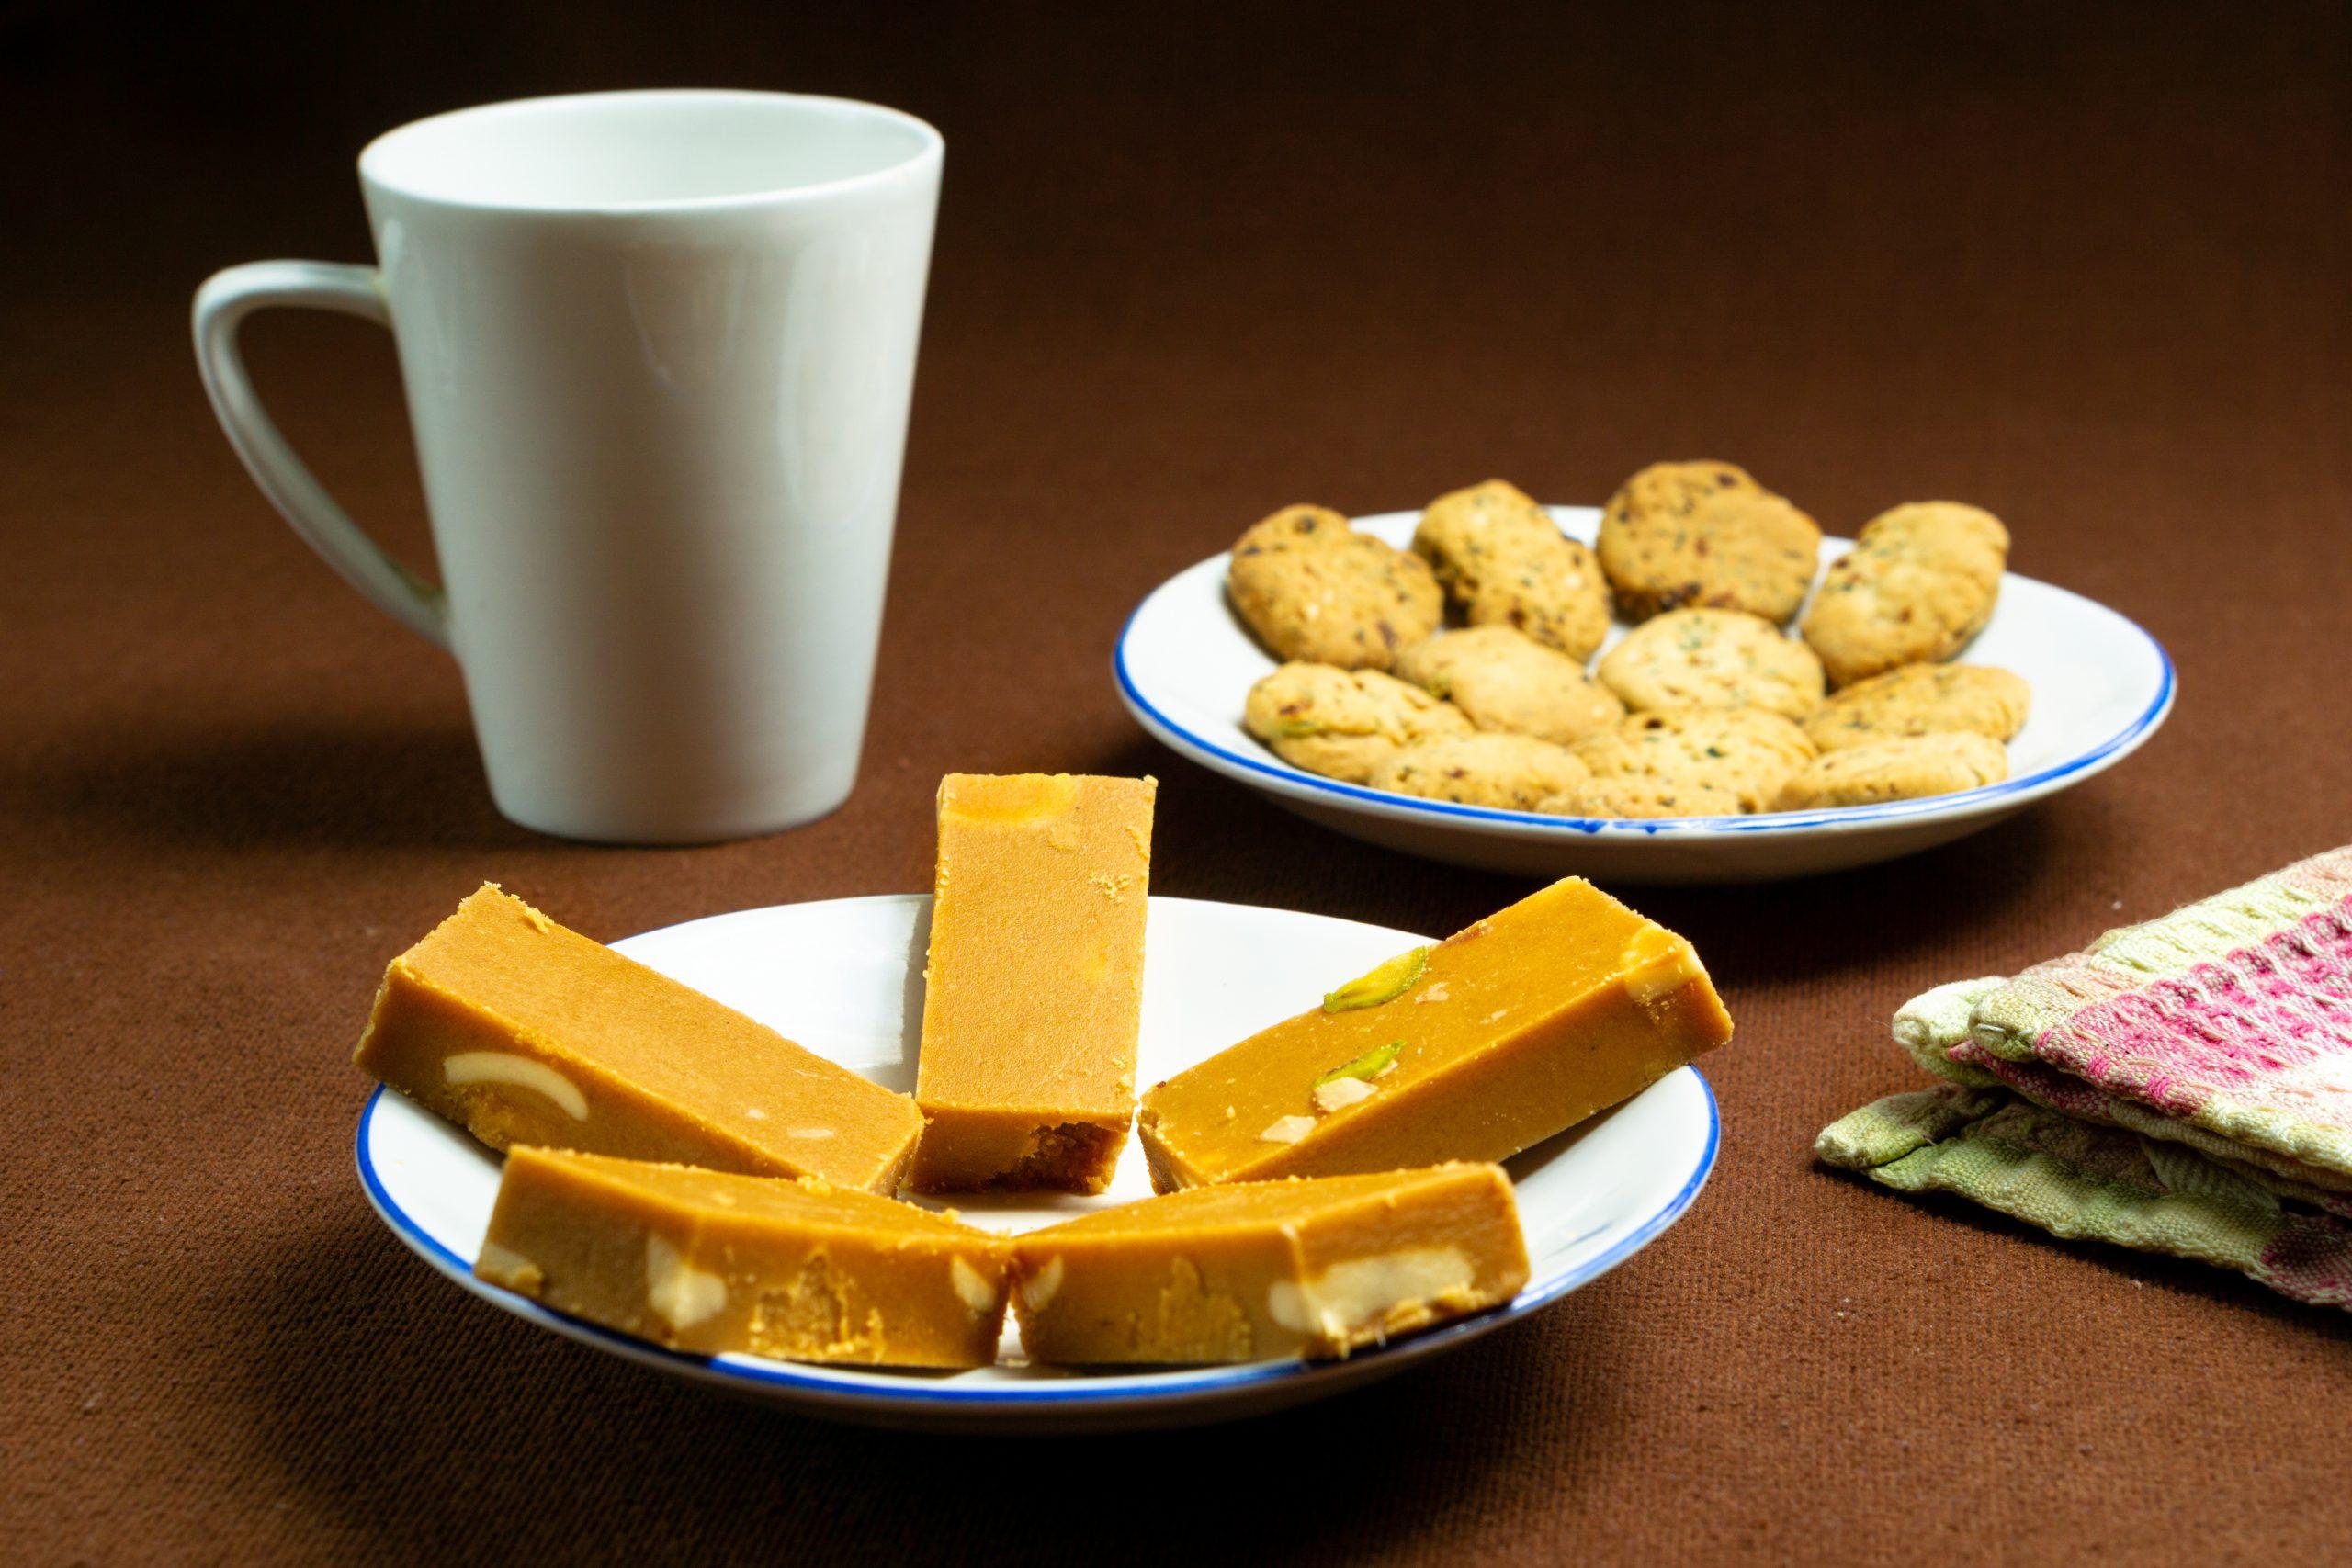 sweets, cookies and mug